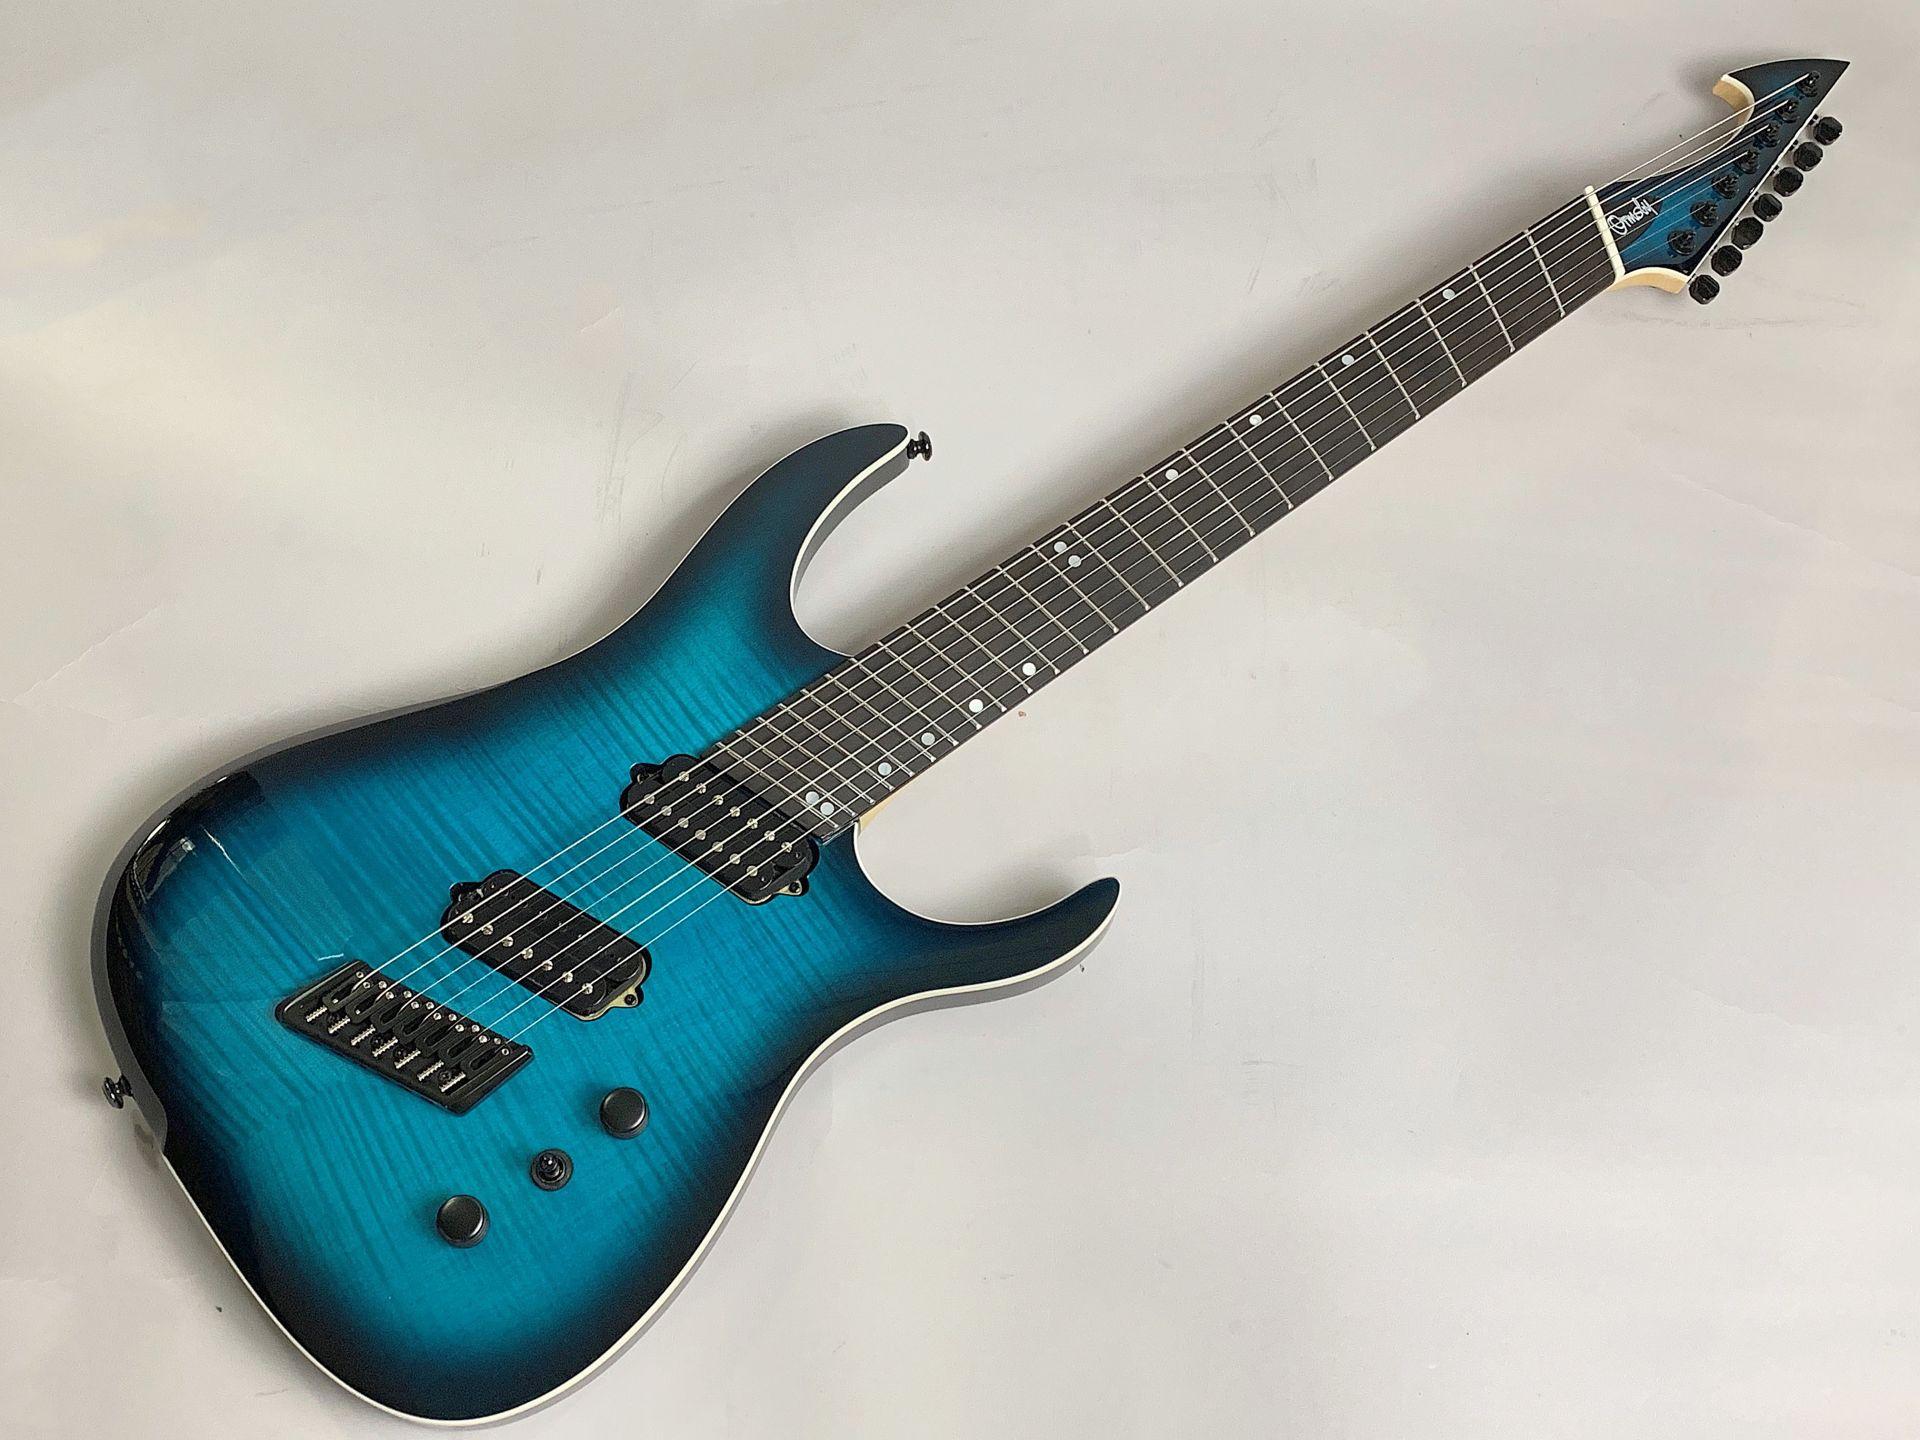 HYPE GTR7 FMMS Beto Blue